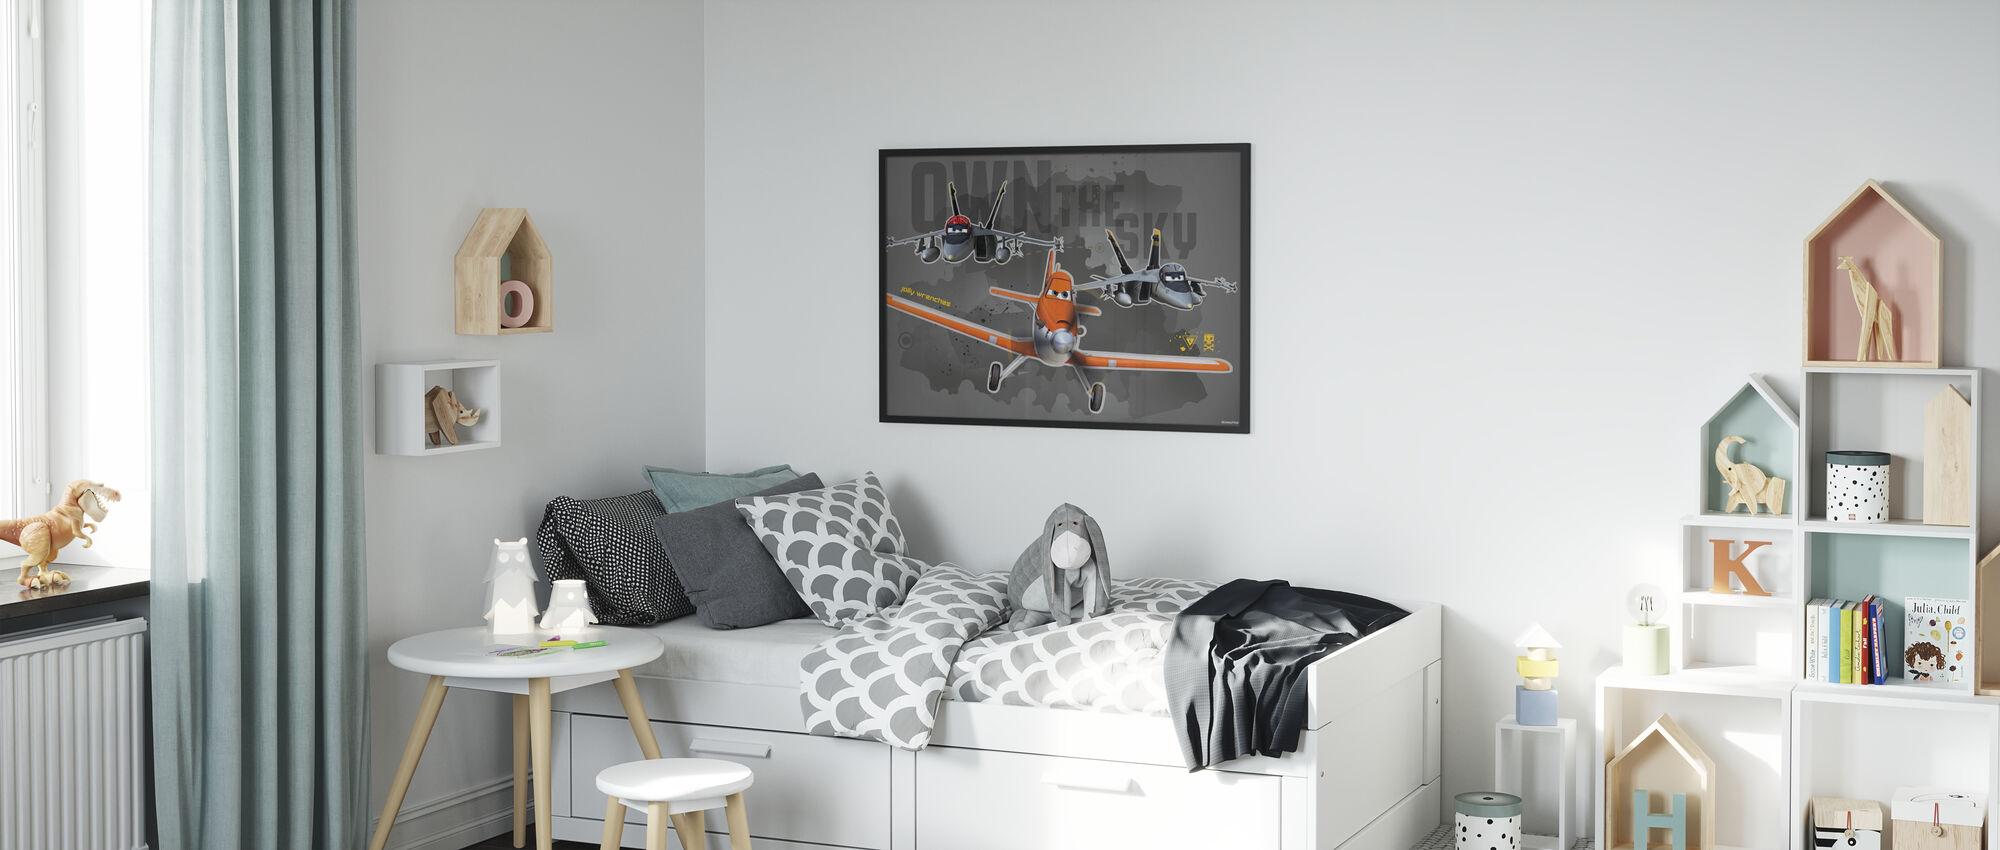 Fly - Jolly Skiftenøkler - Innrammet bilde - Barnerom